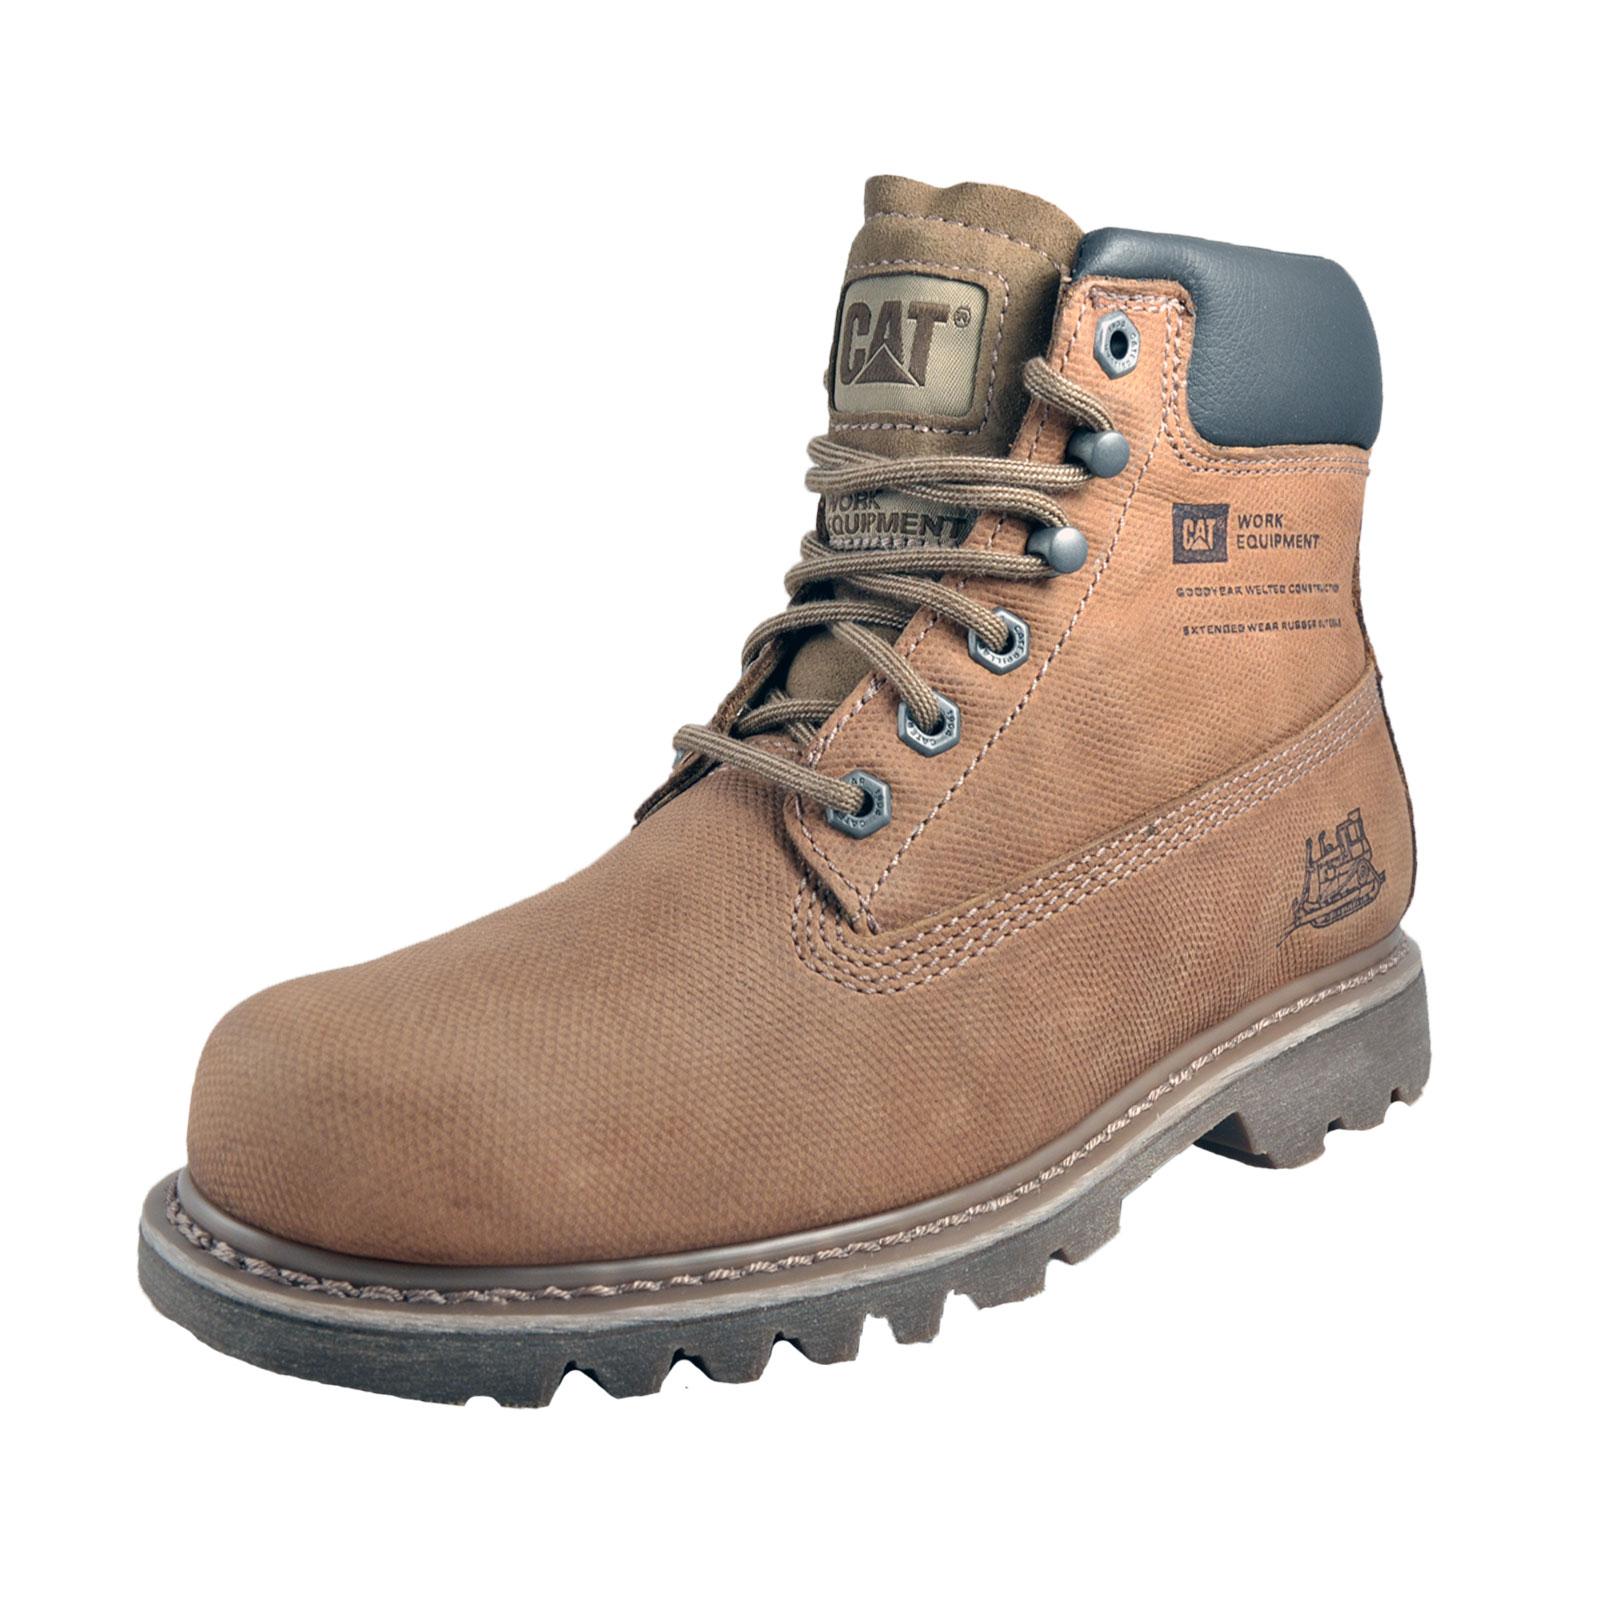 Caterpillar Cat Bruiser Mens Premium Leather Boots Drifted